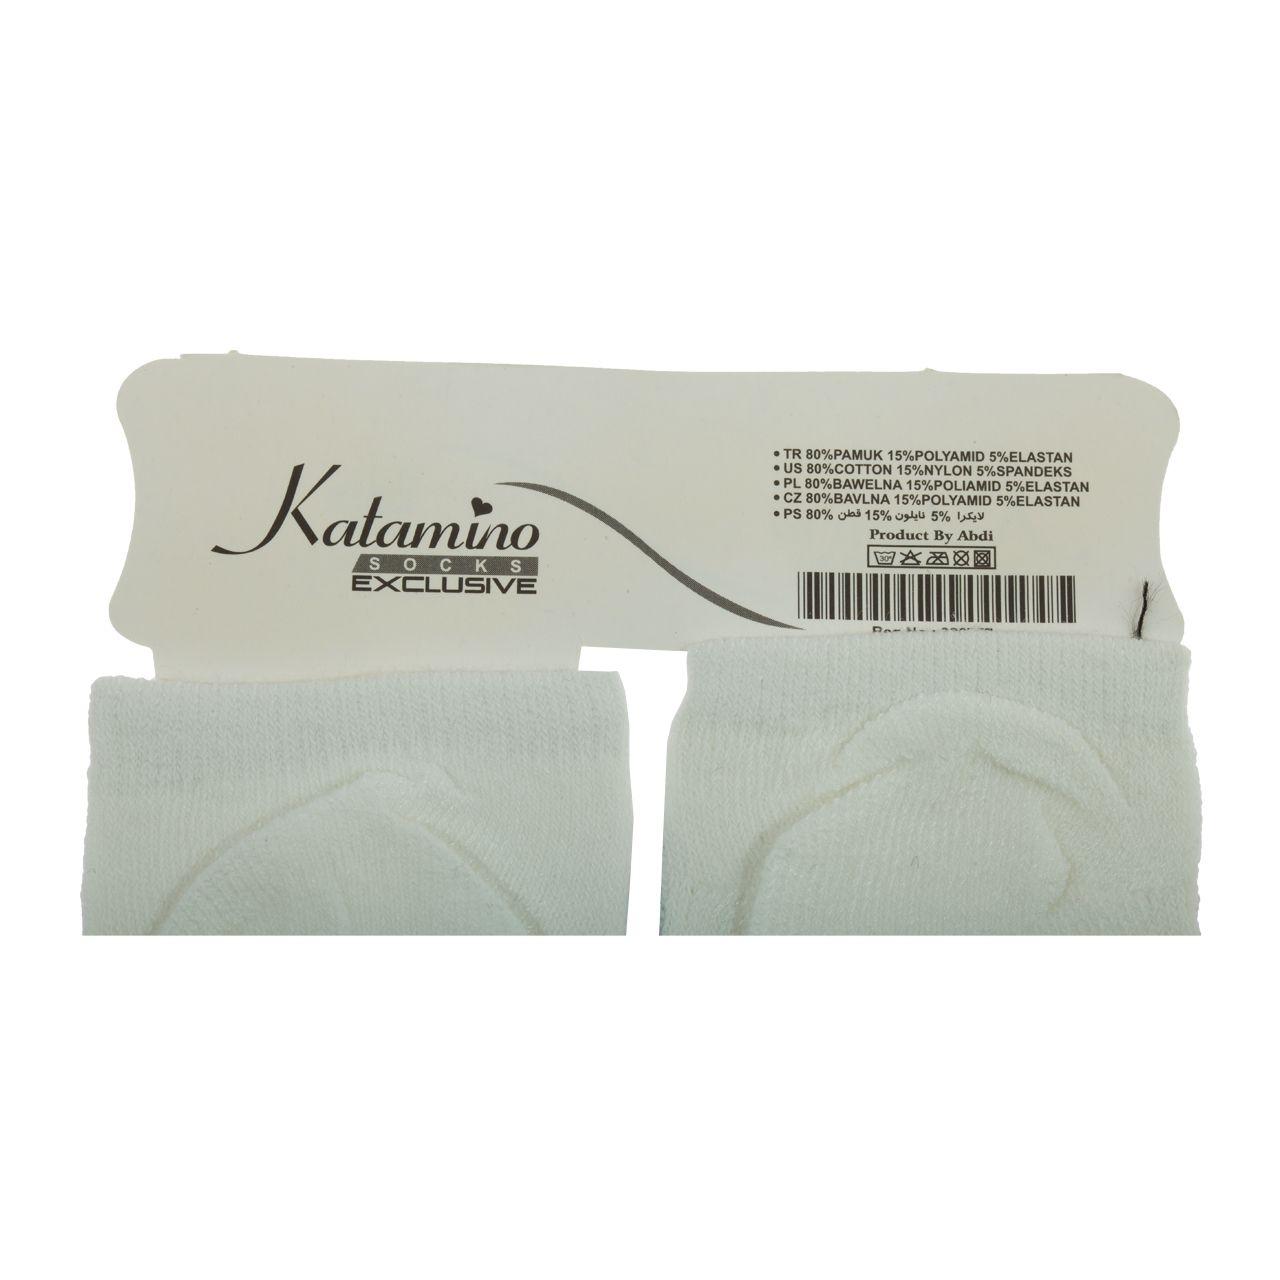 جوراب نوزاد کاتامینو طرح گربه ملوس  -  - 1